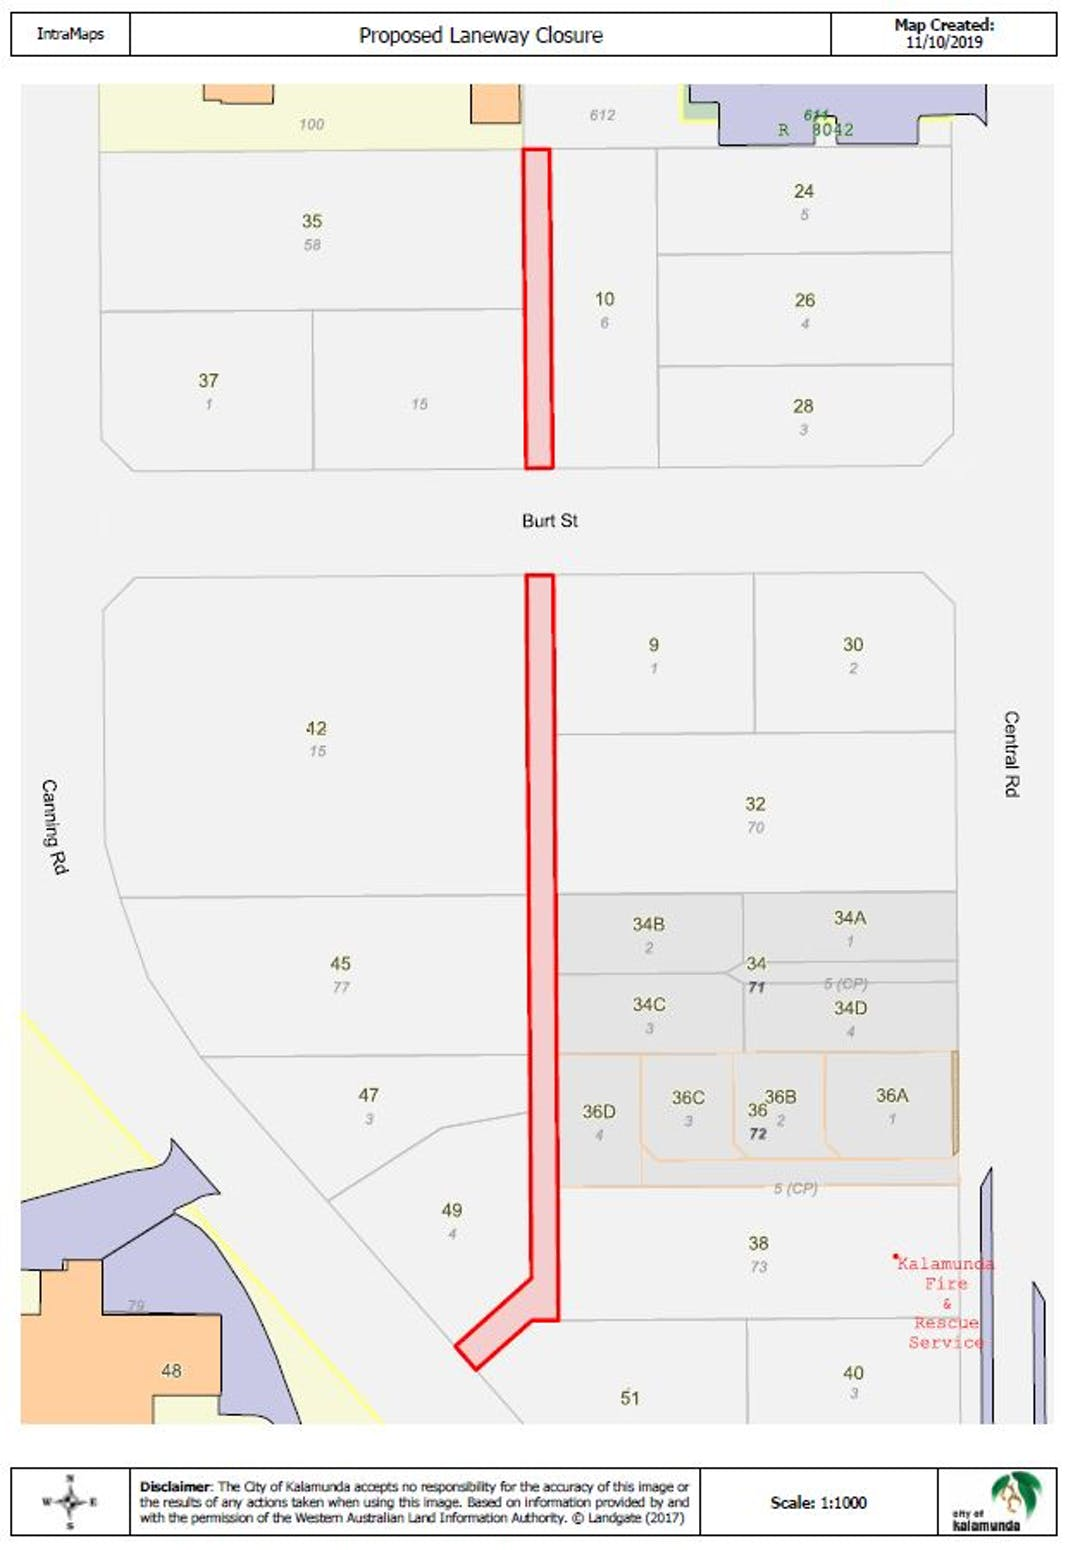 Proposed Permanent Road Closure: Laneway between Canning Road, Burt Street & Kalamunda Bus Station